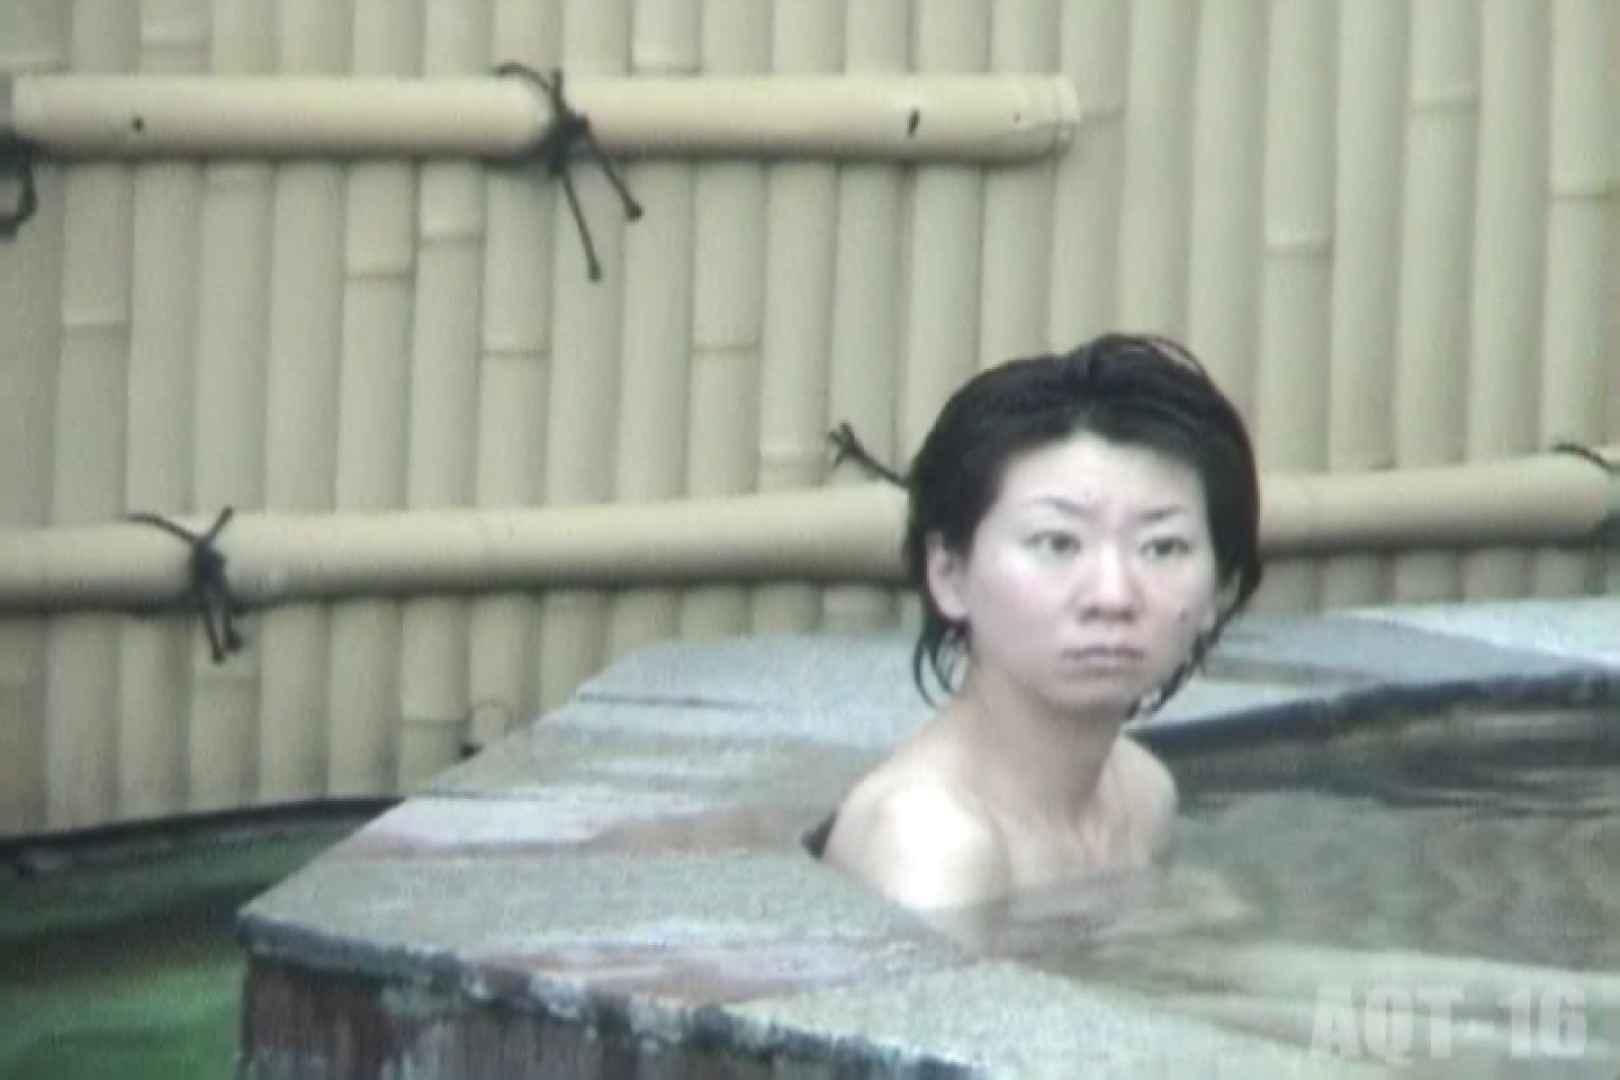 Aquaな露天風呂Vol.842 露天風呂編  82PIX 34